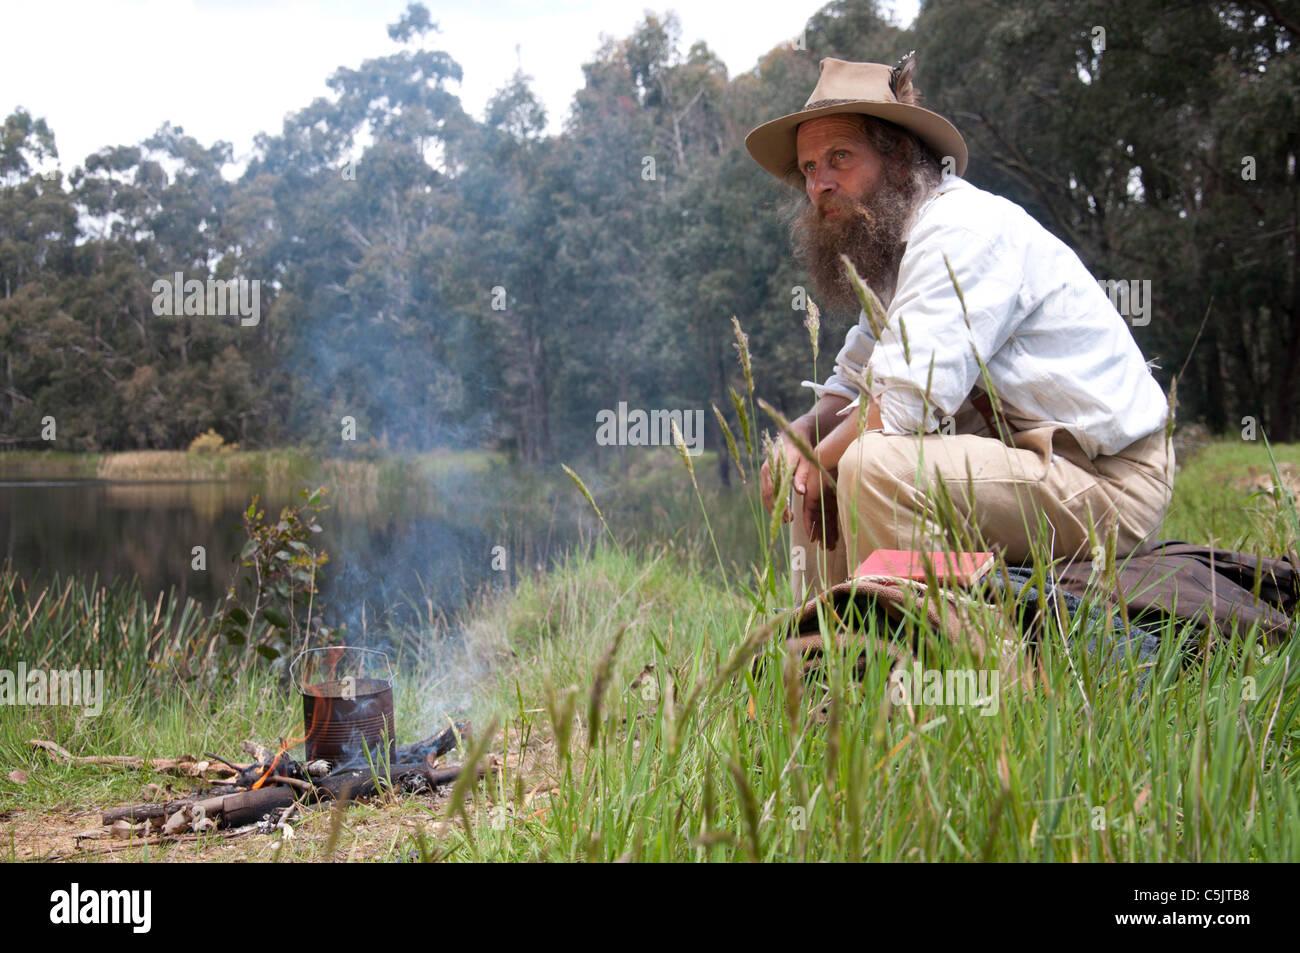 An Australian Bushman Stock Photo Royalty Free Image